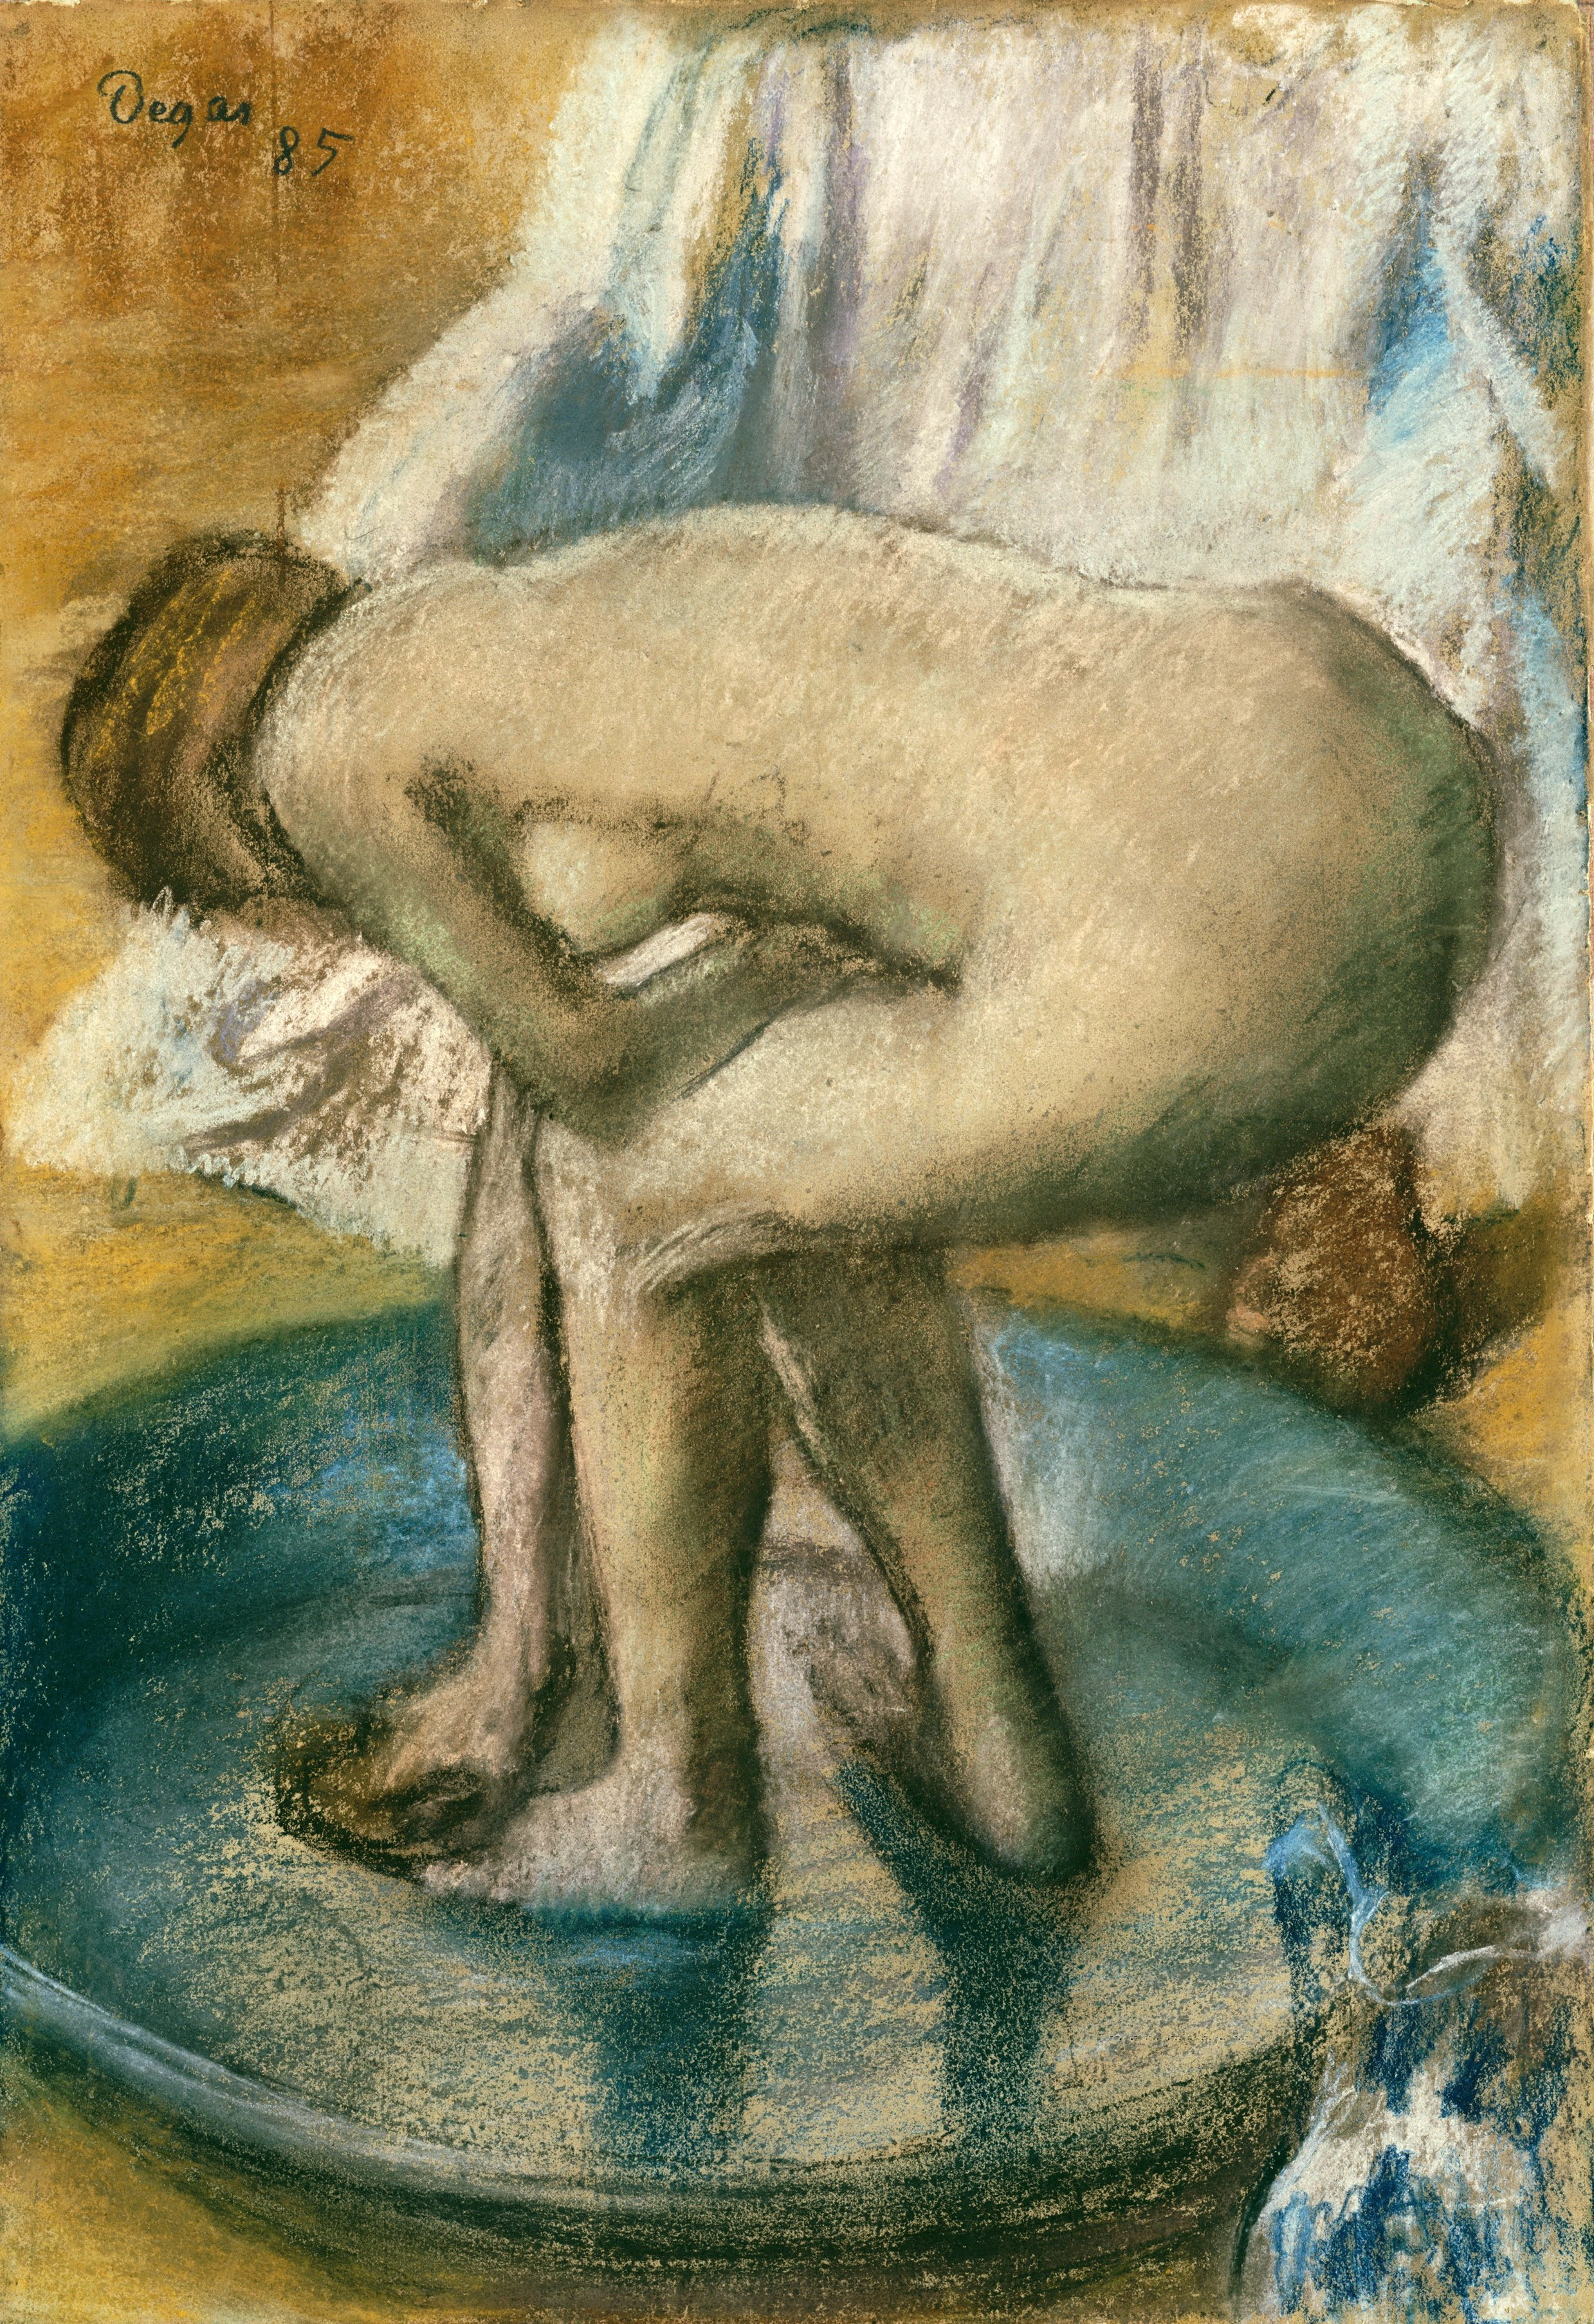 Edgar Degas, 1834-1917. Женщина, купающаяся в тазу. 1885. 81.3 х 56.2 см. Нью-Йорк, музей Метрополитен